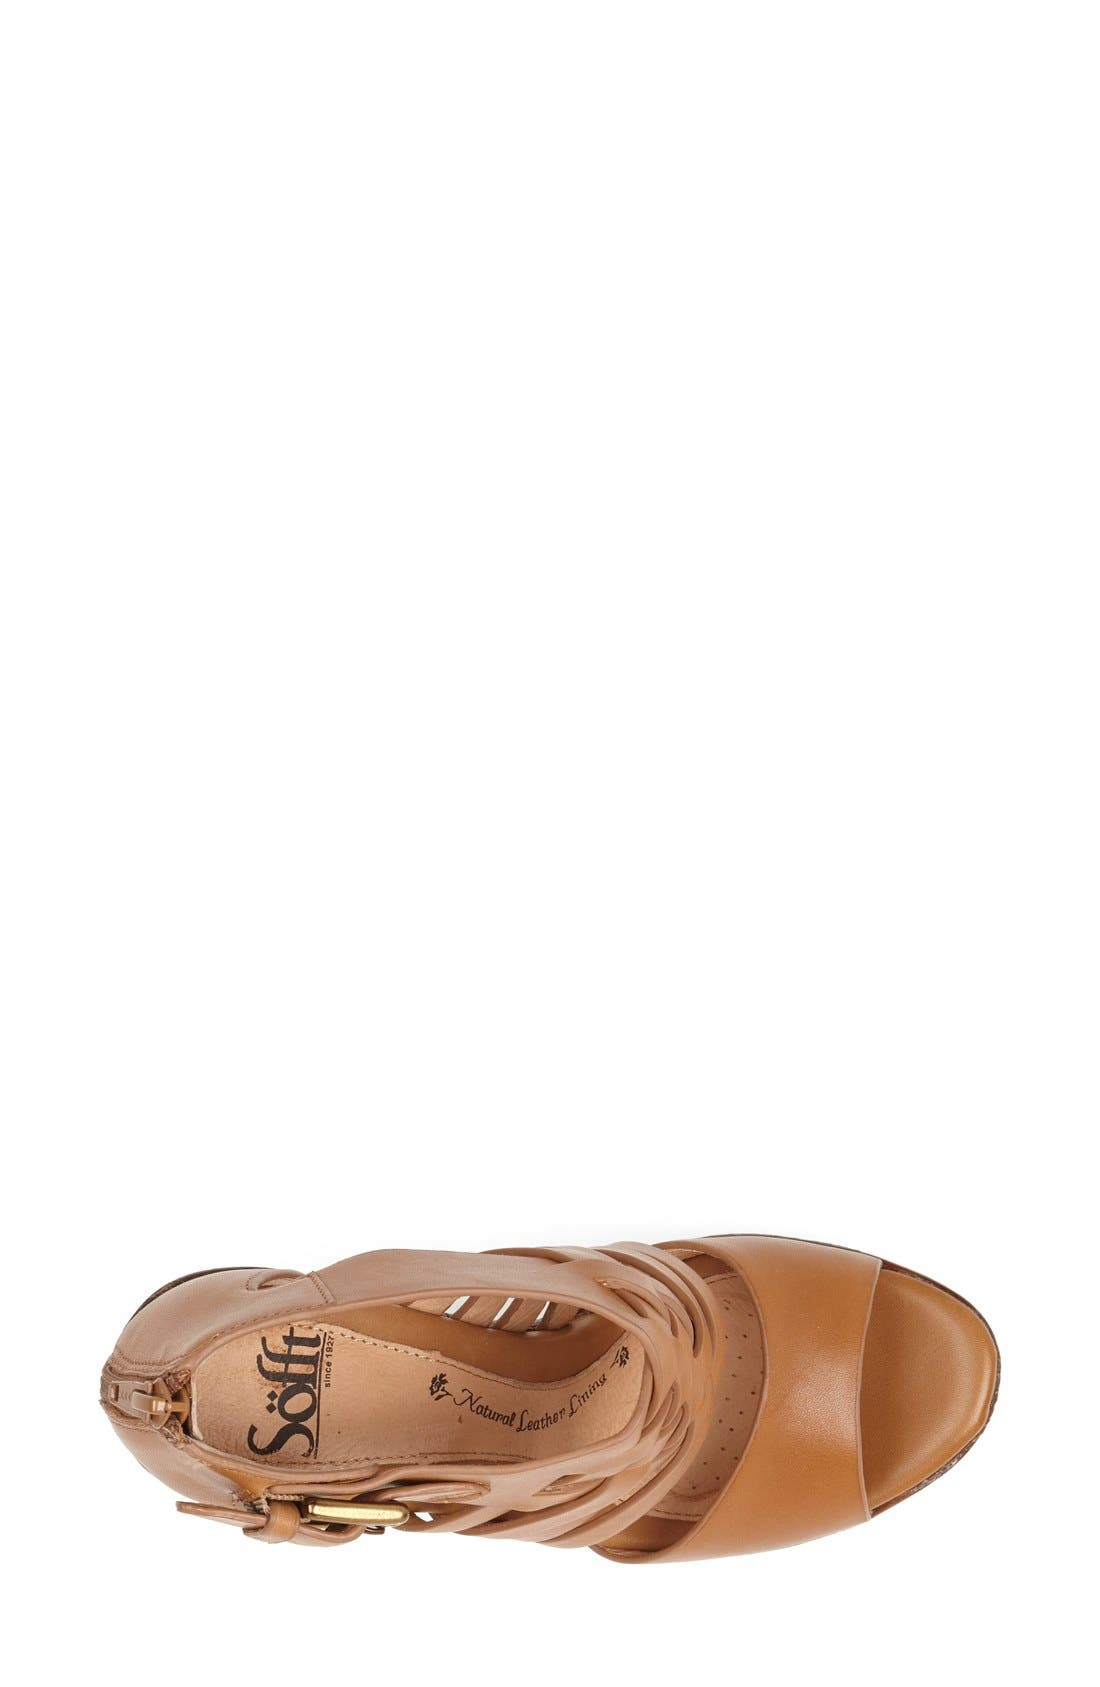 'Ohanna' Leather Sandal,                             Alternate thumbnail 3, color,                             Luggage